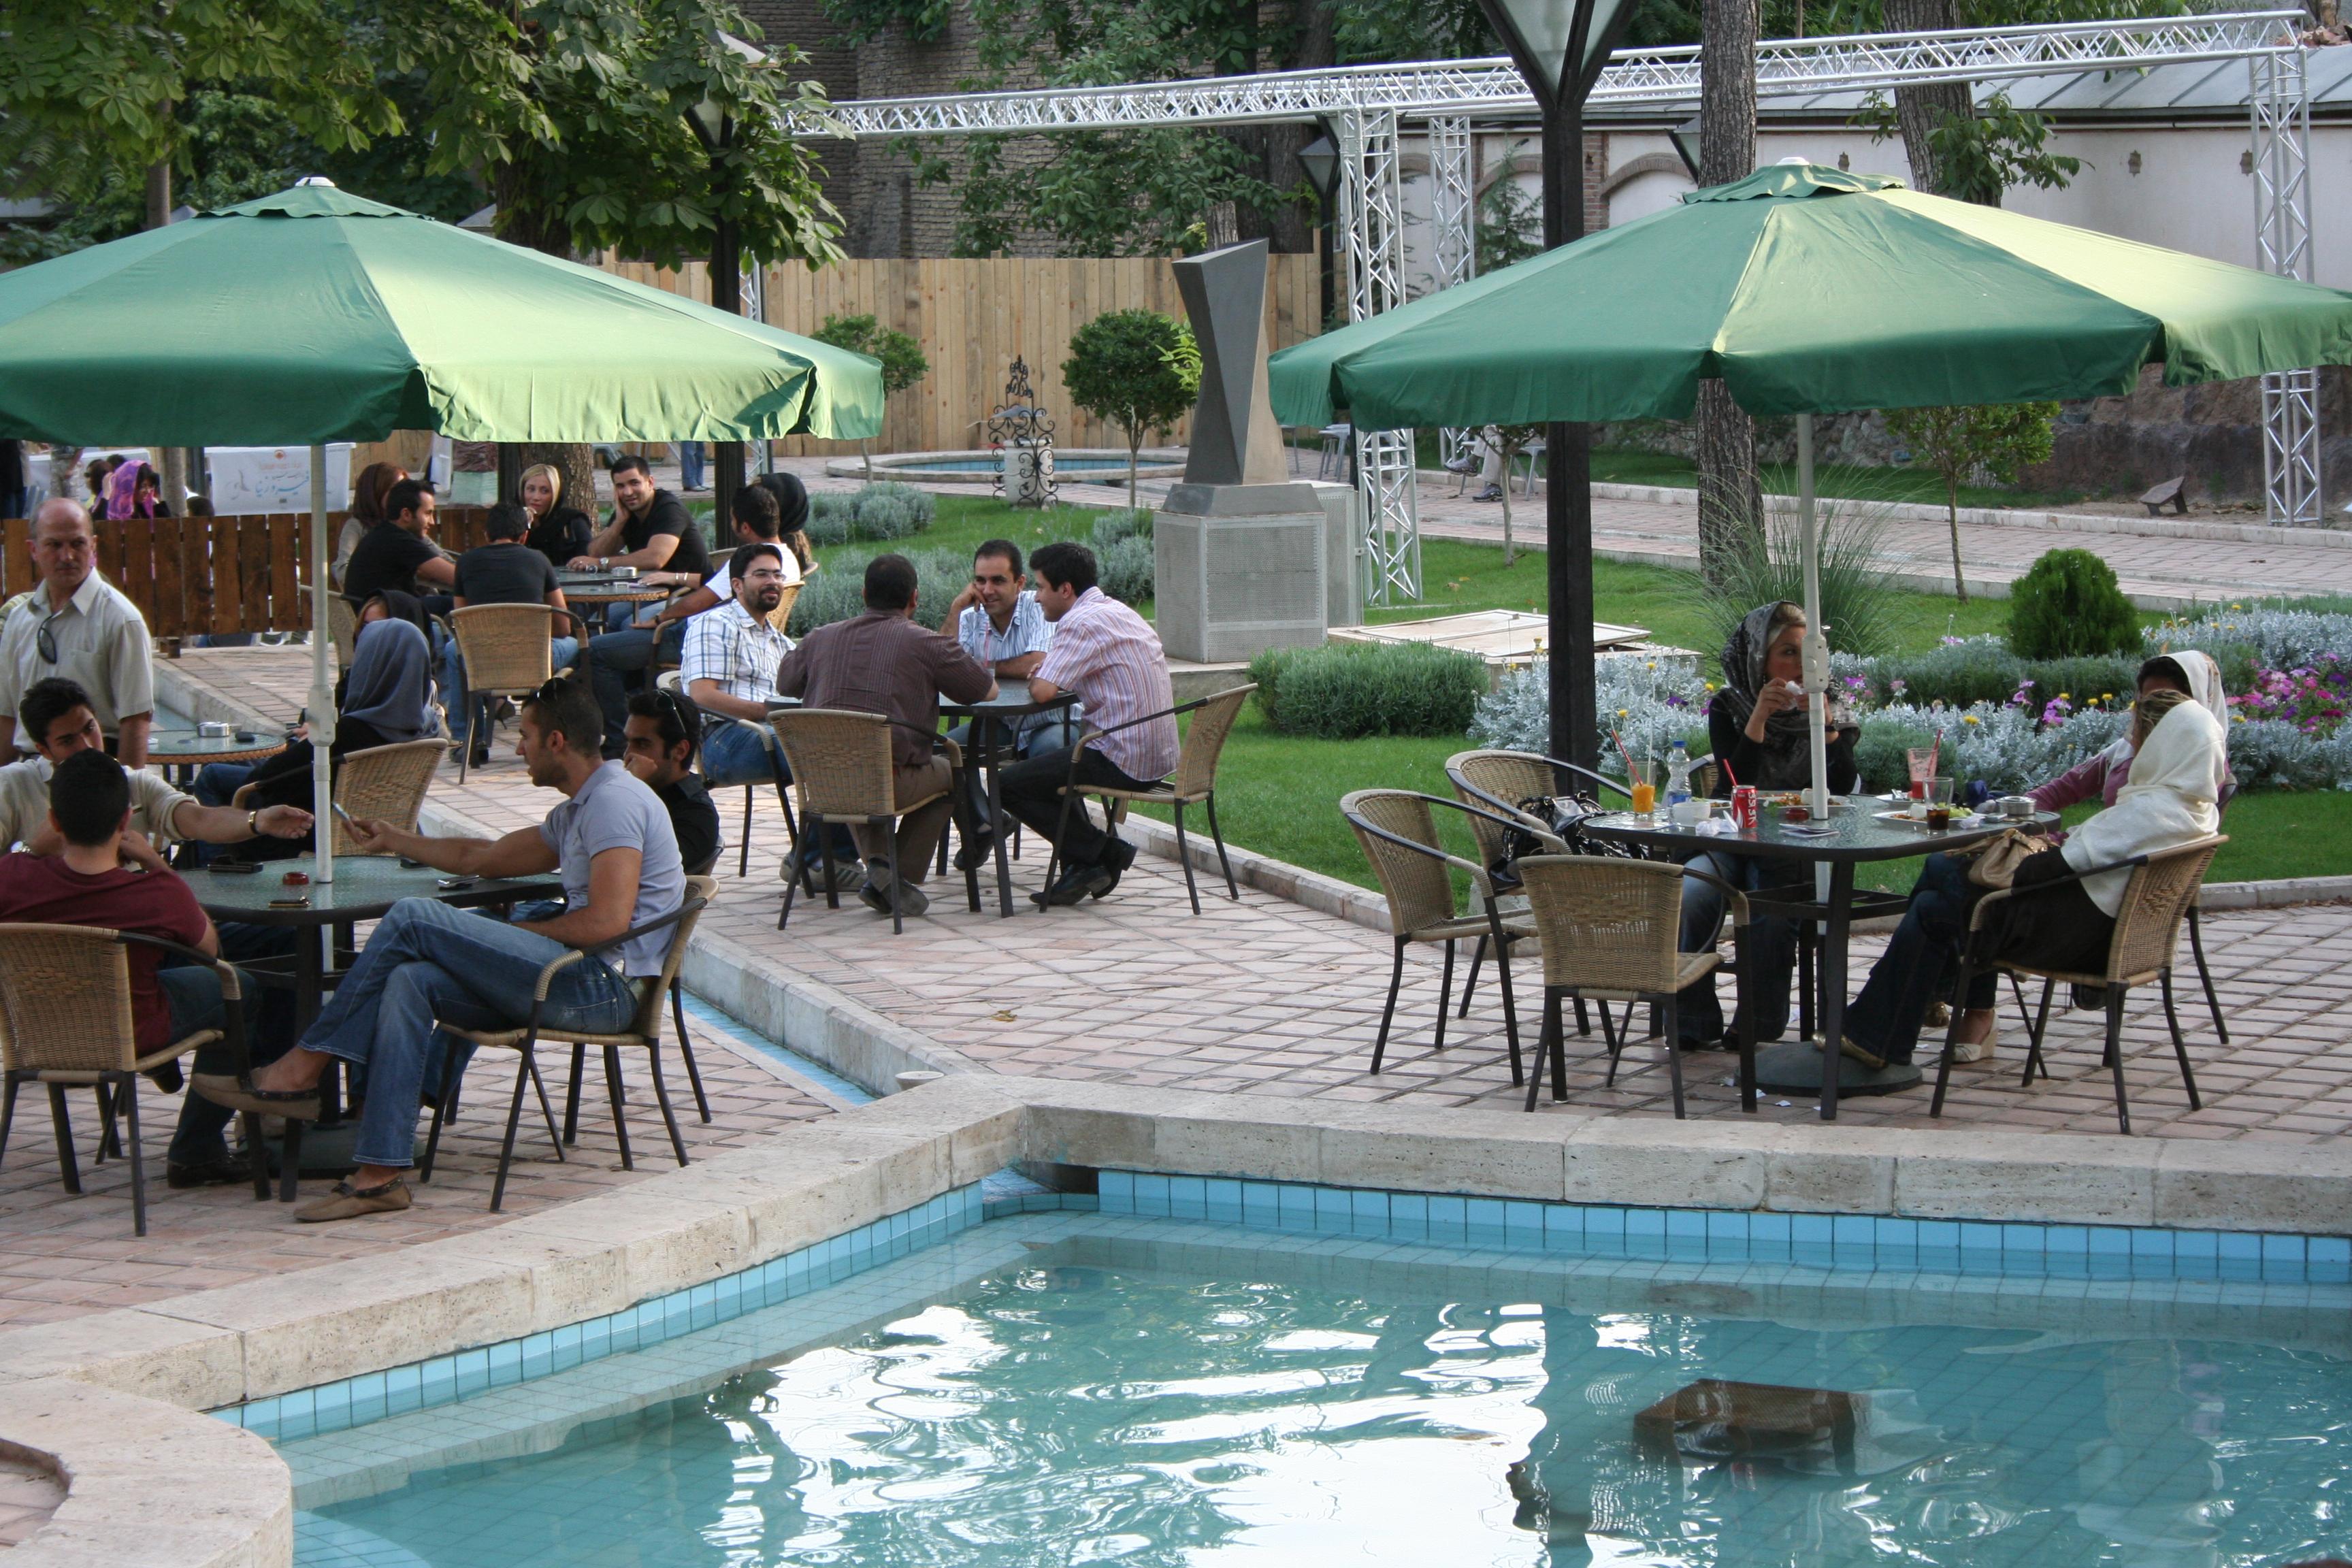 Garden St Cafe Peoria Il Menu